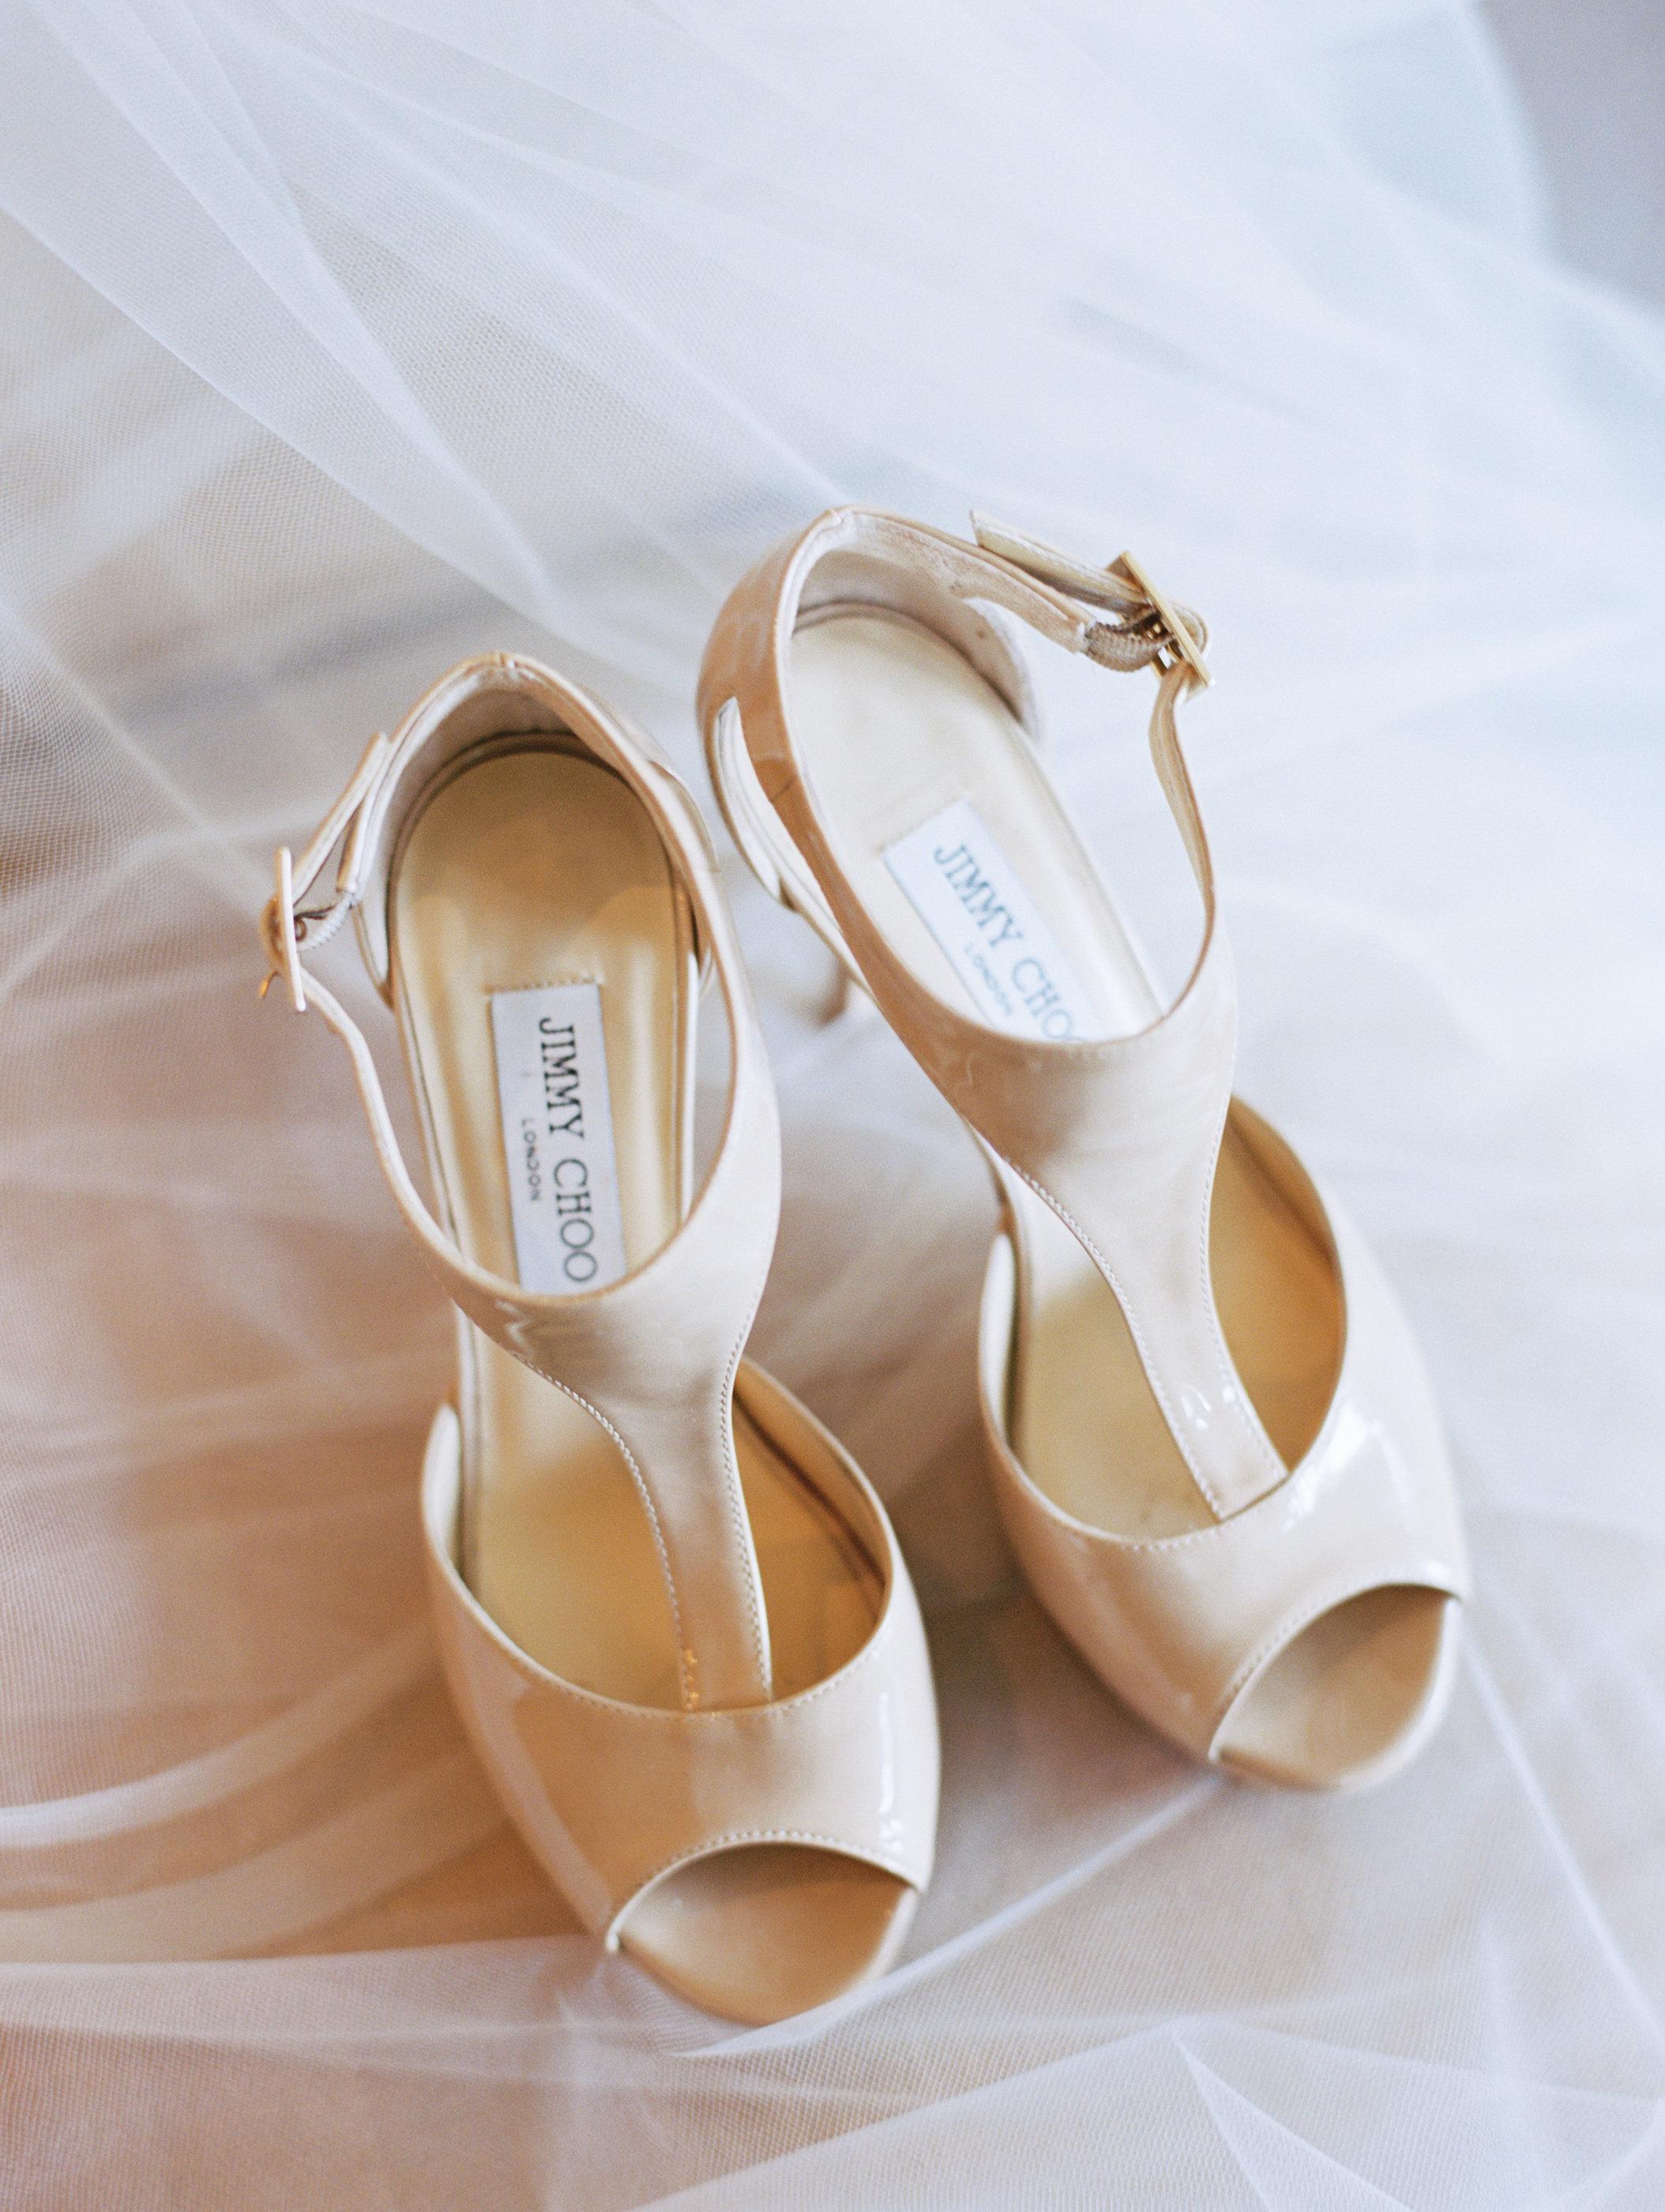 Shoe Details - Kiawah Island, South Carolina - Fall Wedding - Julian Leaver Events